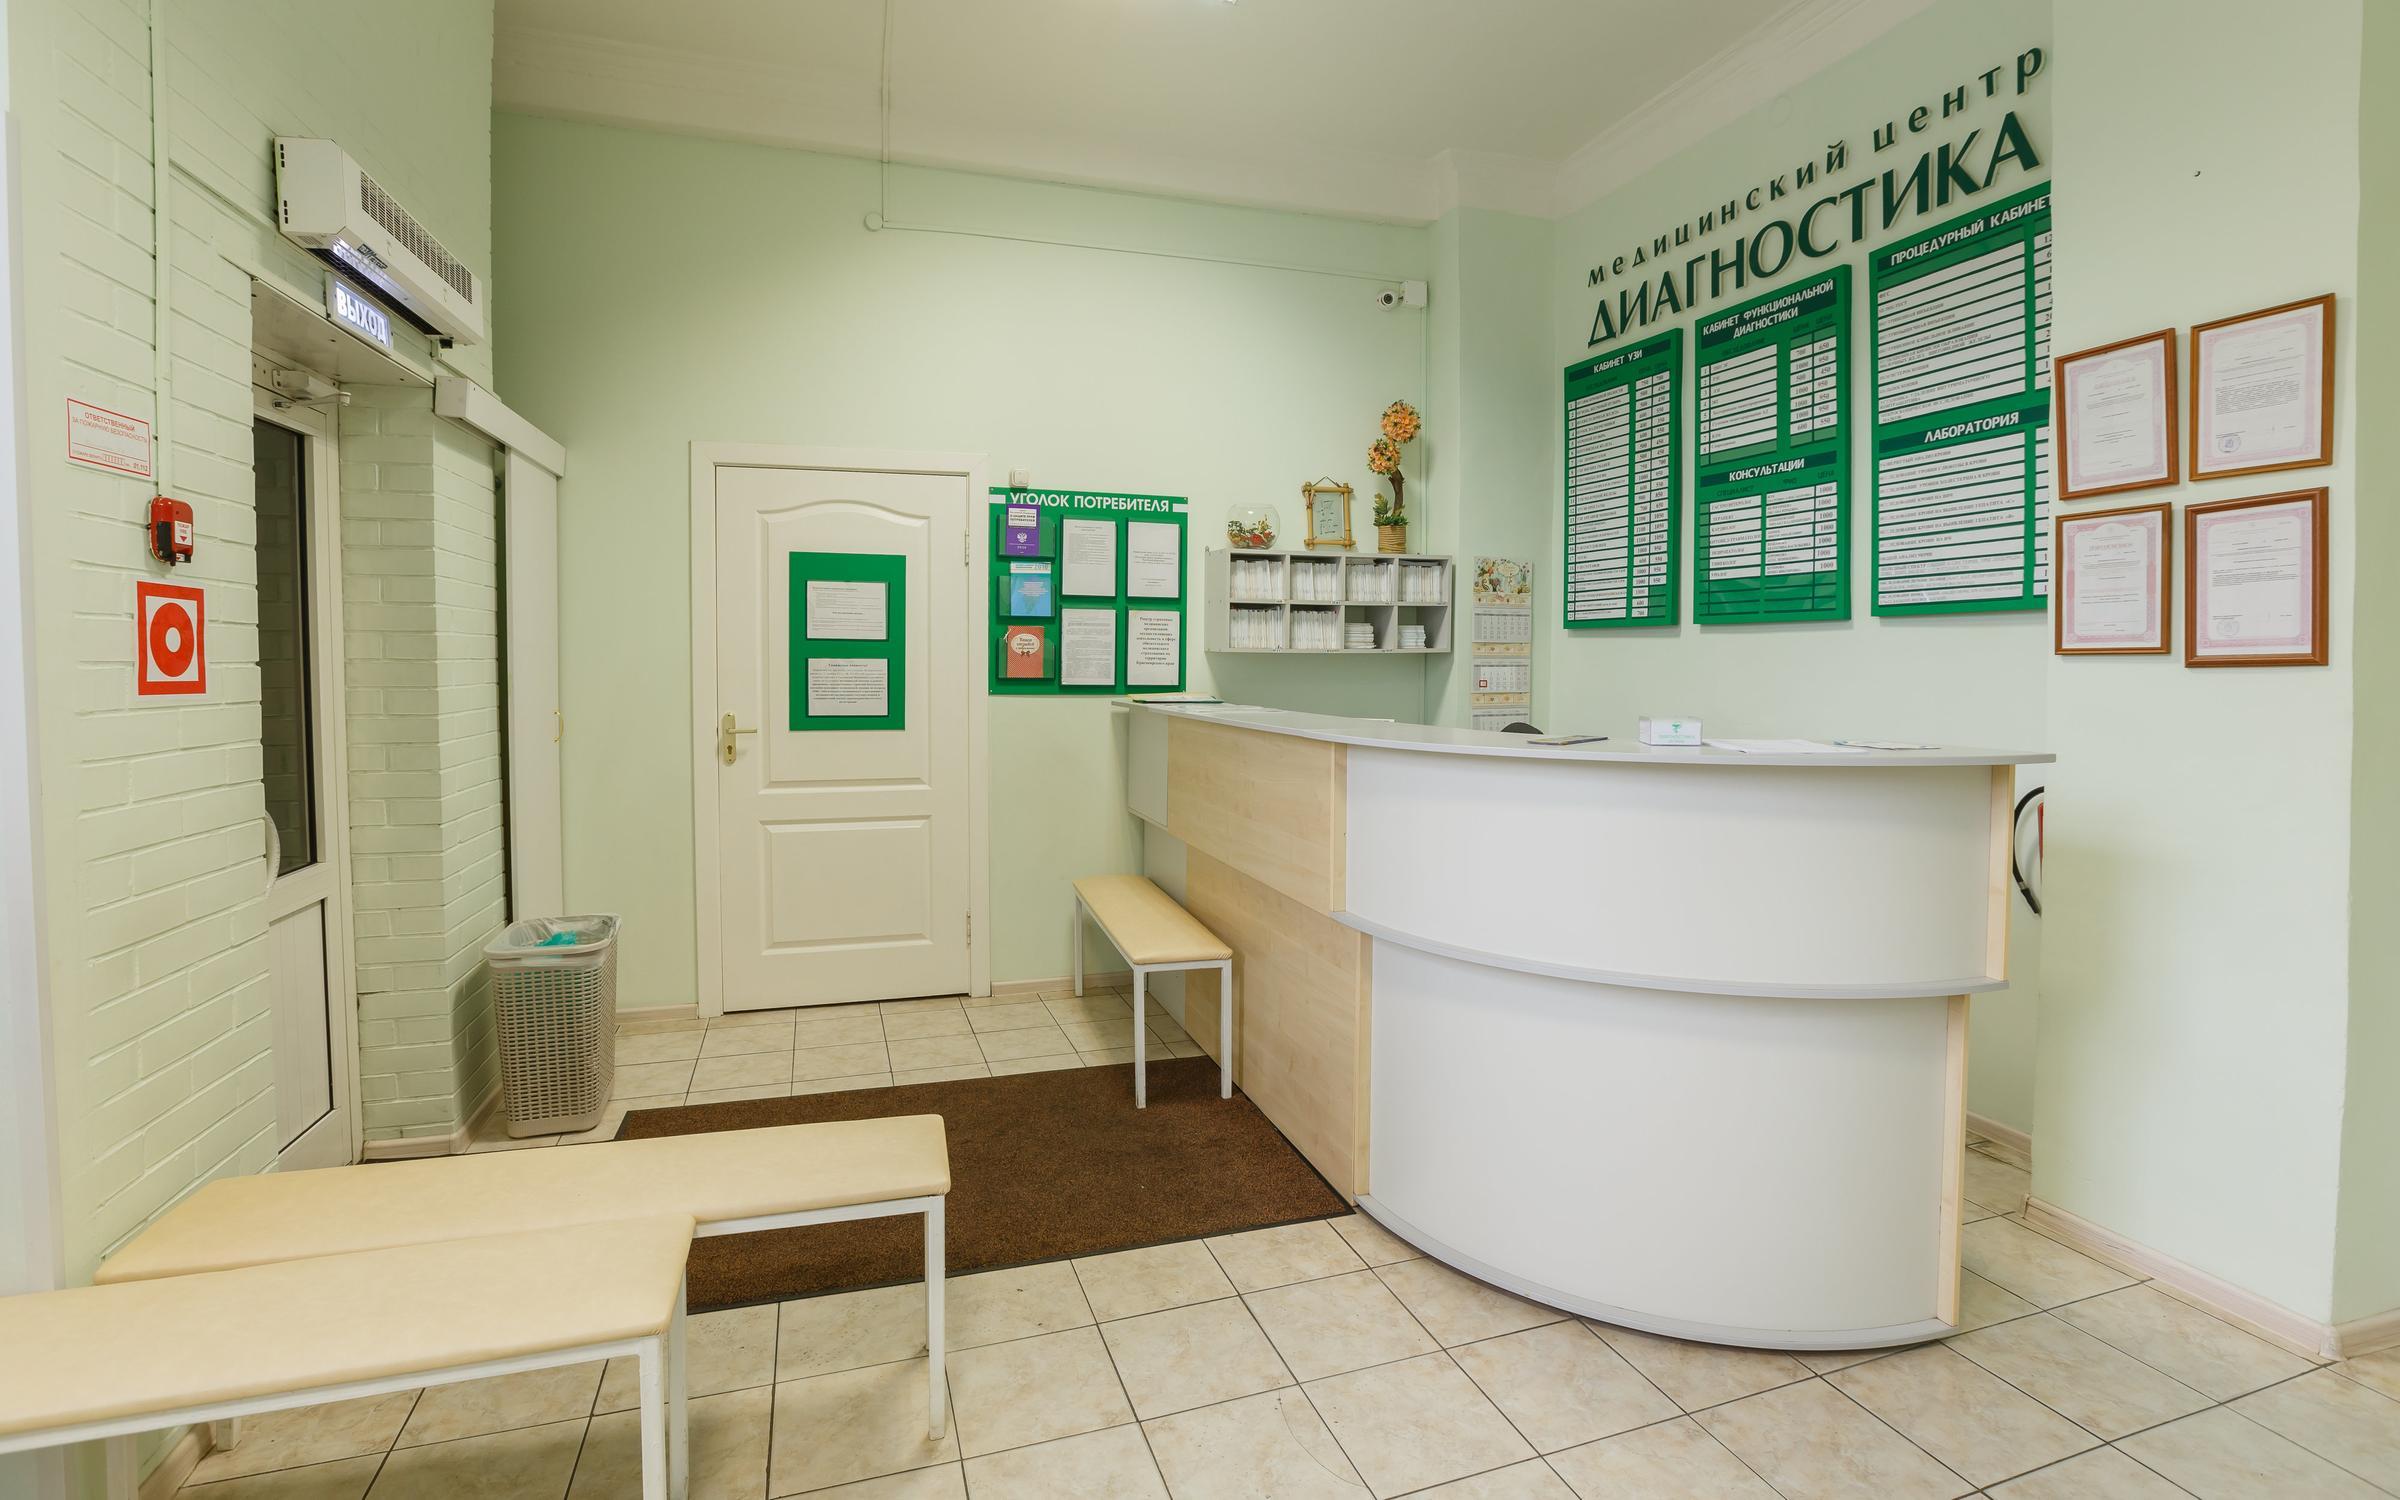 фотография Медицинского центра Диагностика на улице Мичурина